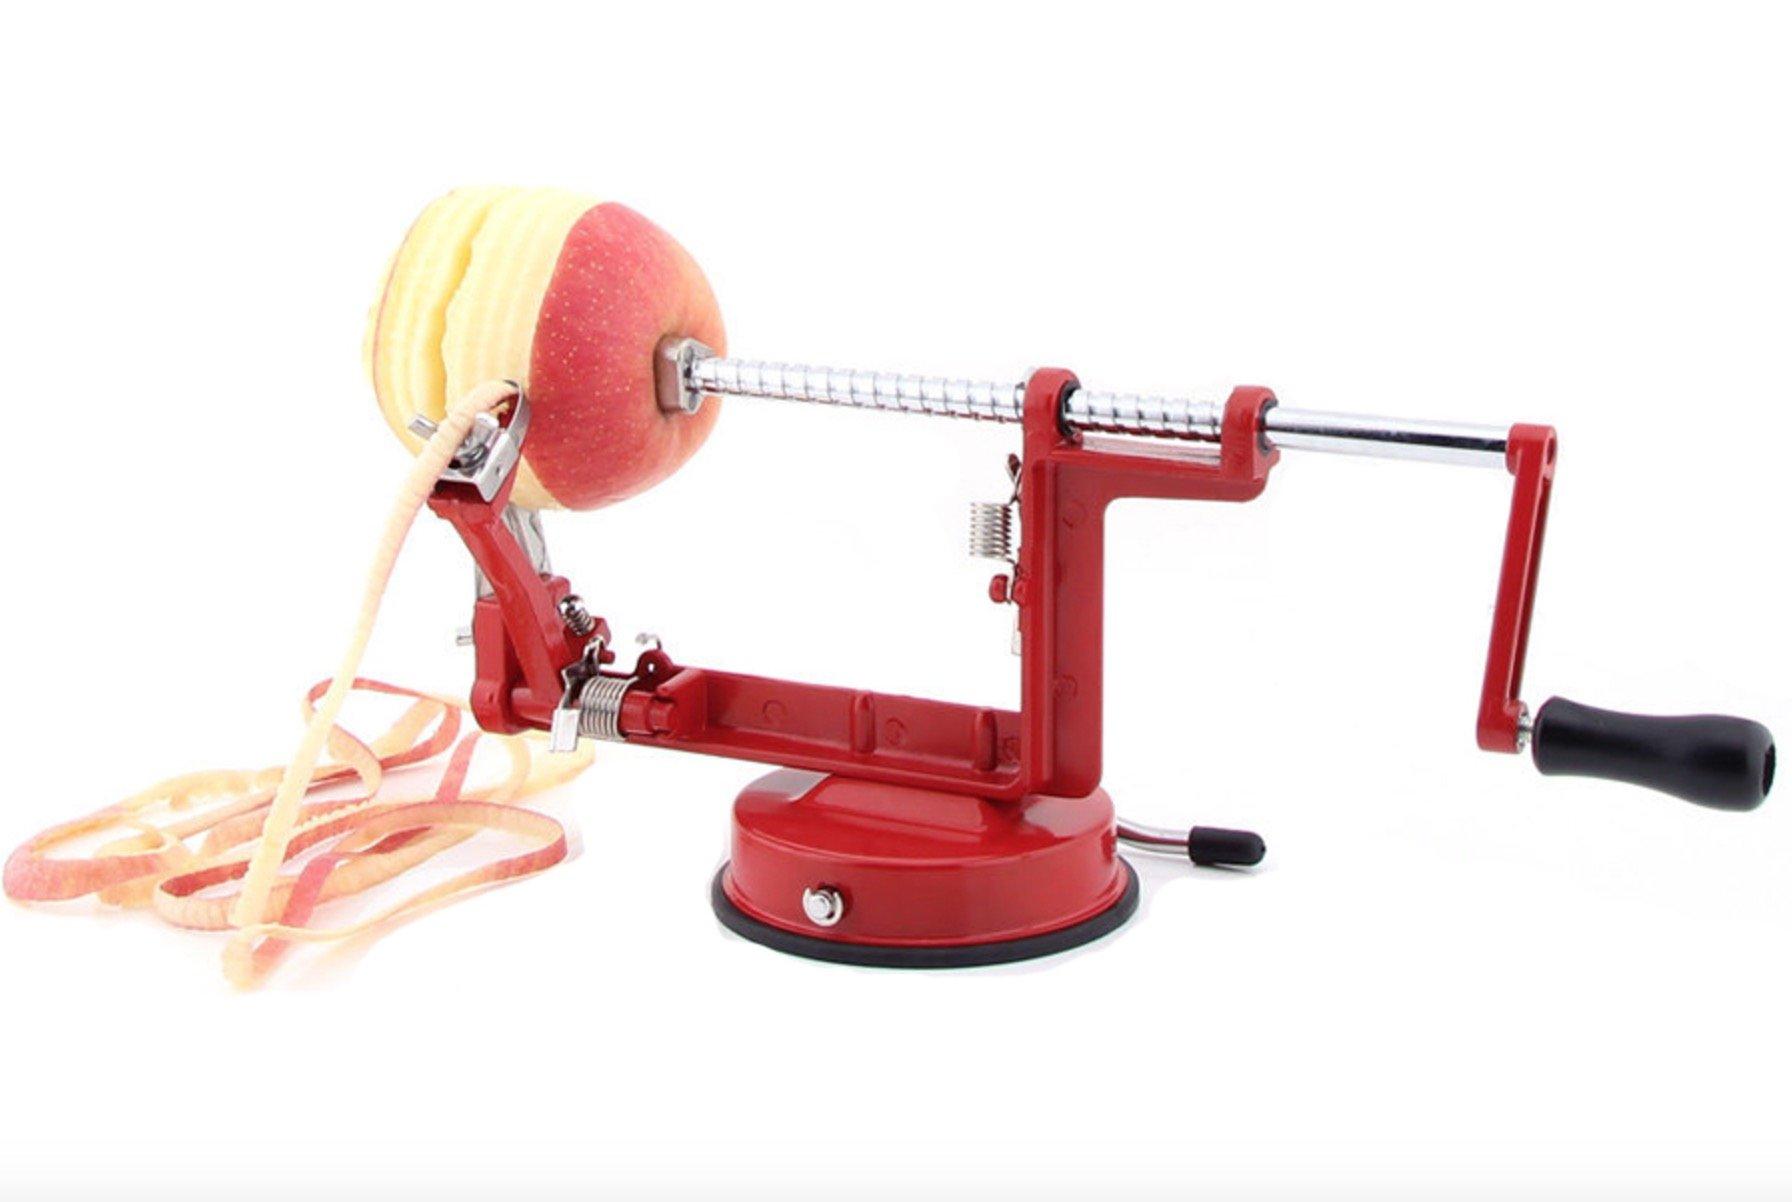 LOYODA Apple Peeler Corer Slicer Machine - Vacuum Suction Base Durable Potato Apples Slicing Coring and Peeling Razor Cast Iron Countertop Stainless Steel Blades - Fruit Veg Dicer Cutter Kitchen Tool